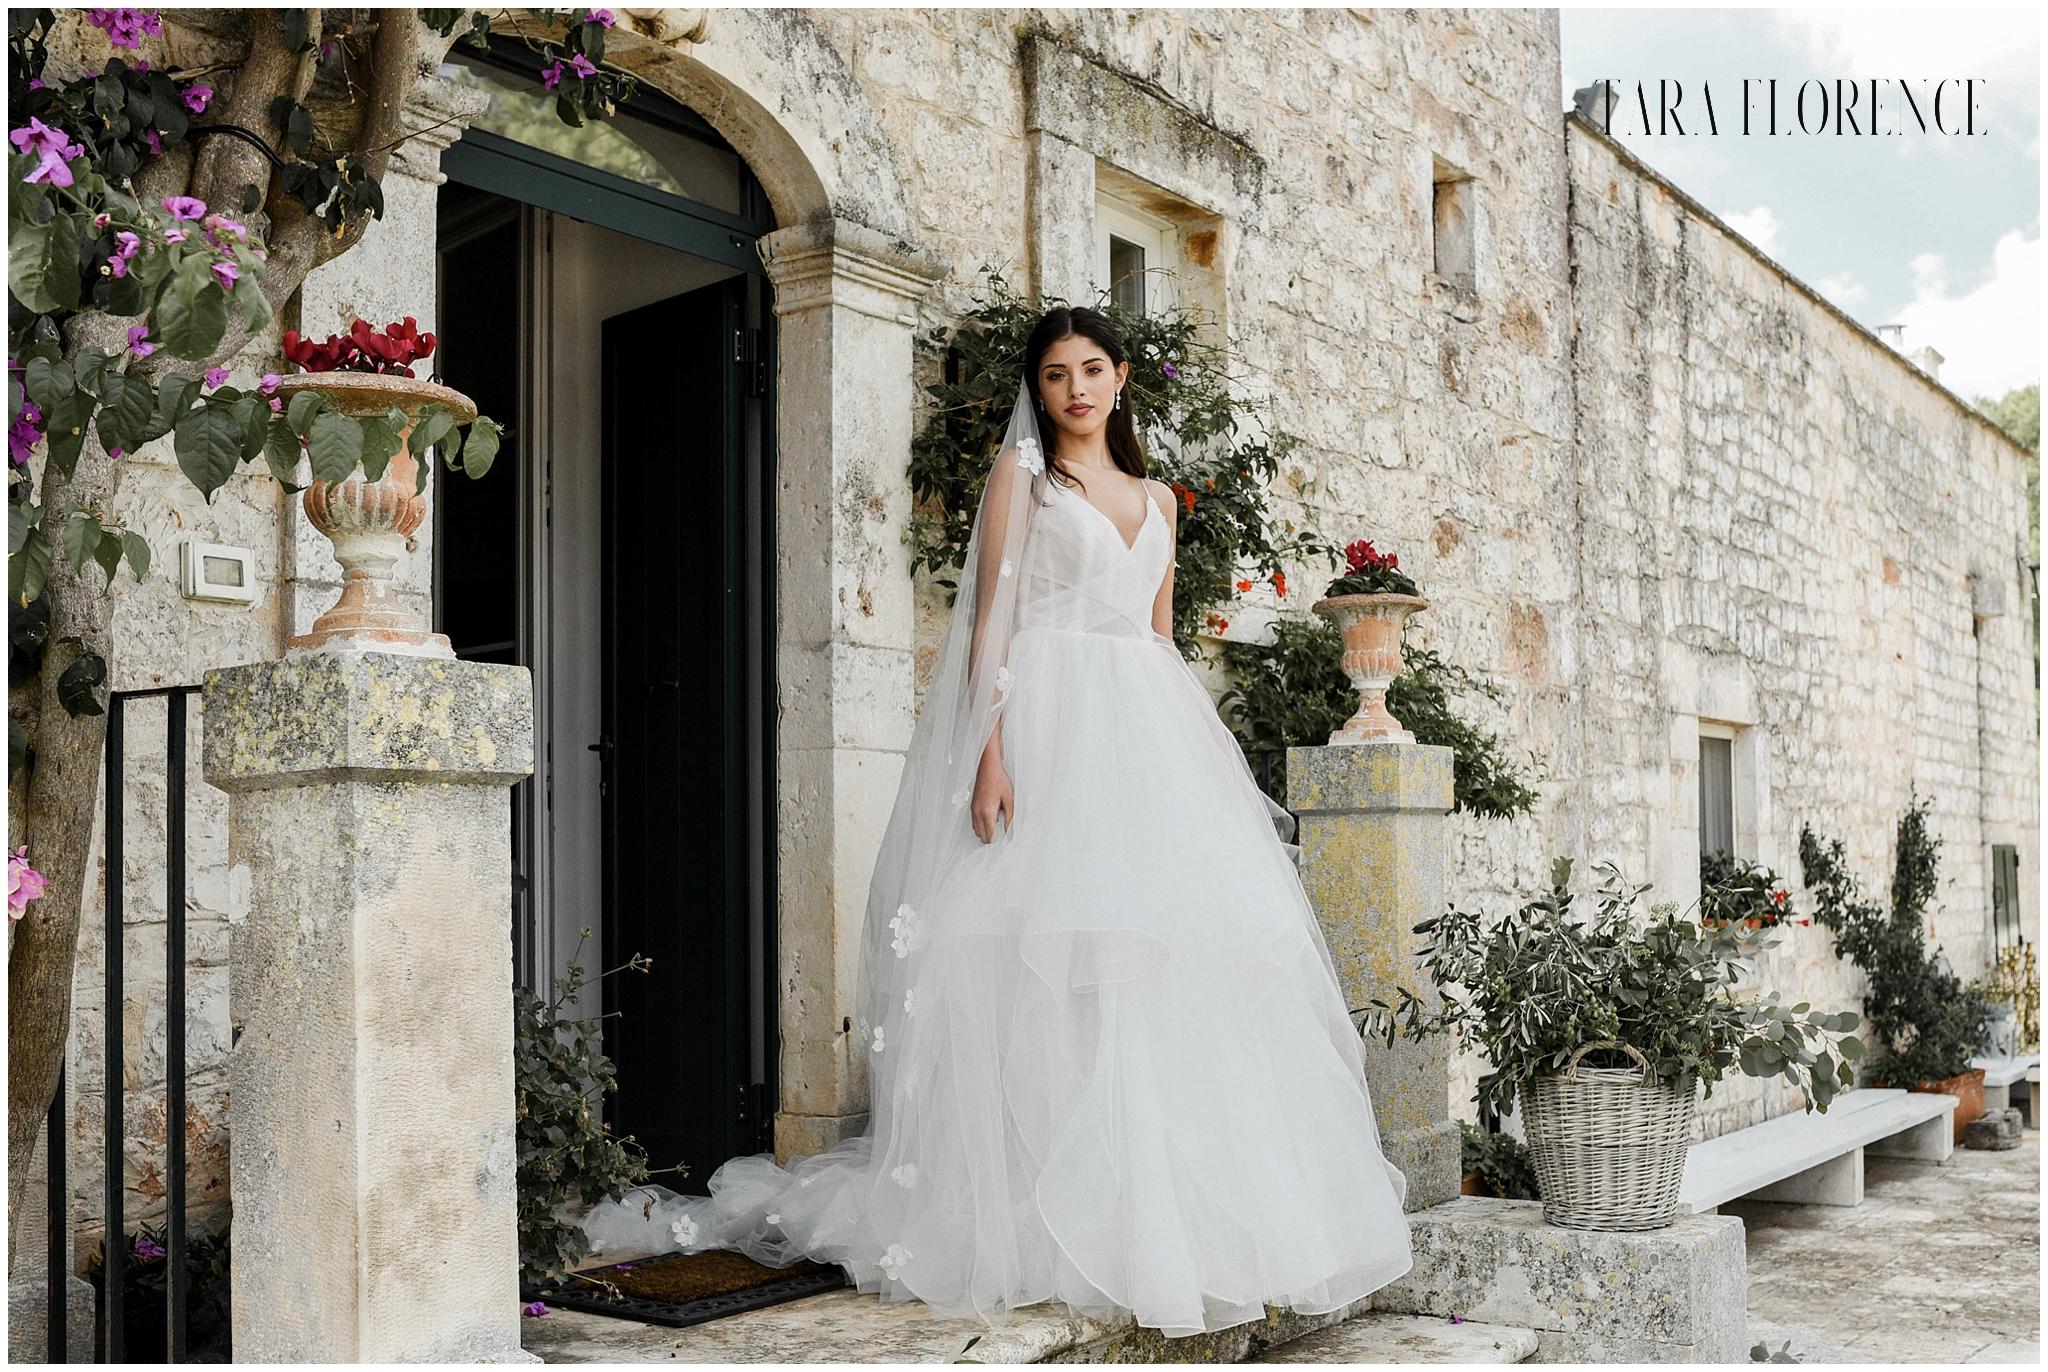 Puglia-Tara-Florence-Bridal-Editorial-125_WEB.jpg